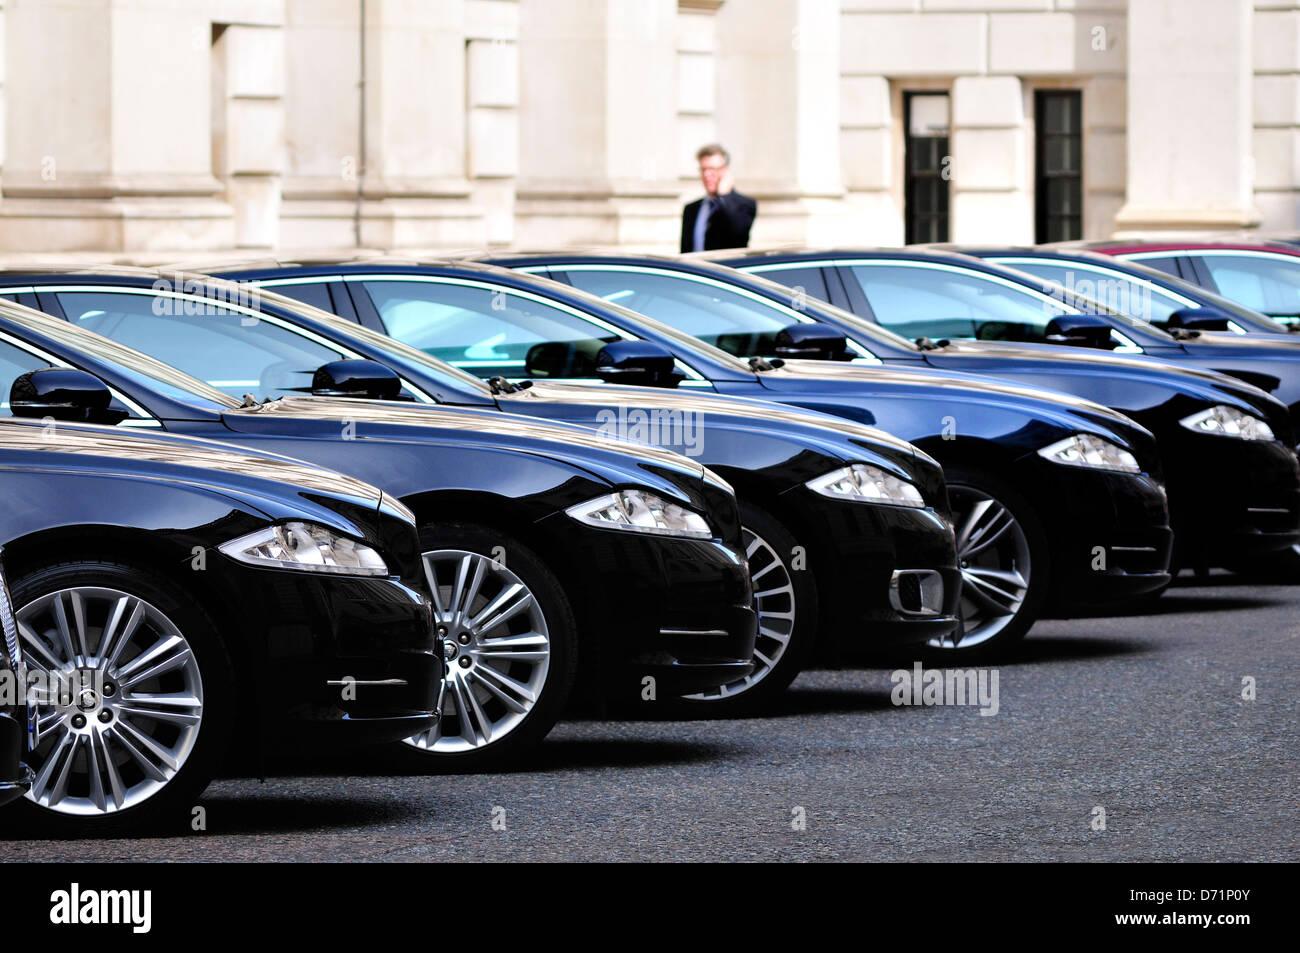 london england uk king charles street official government cars jaguar